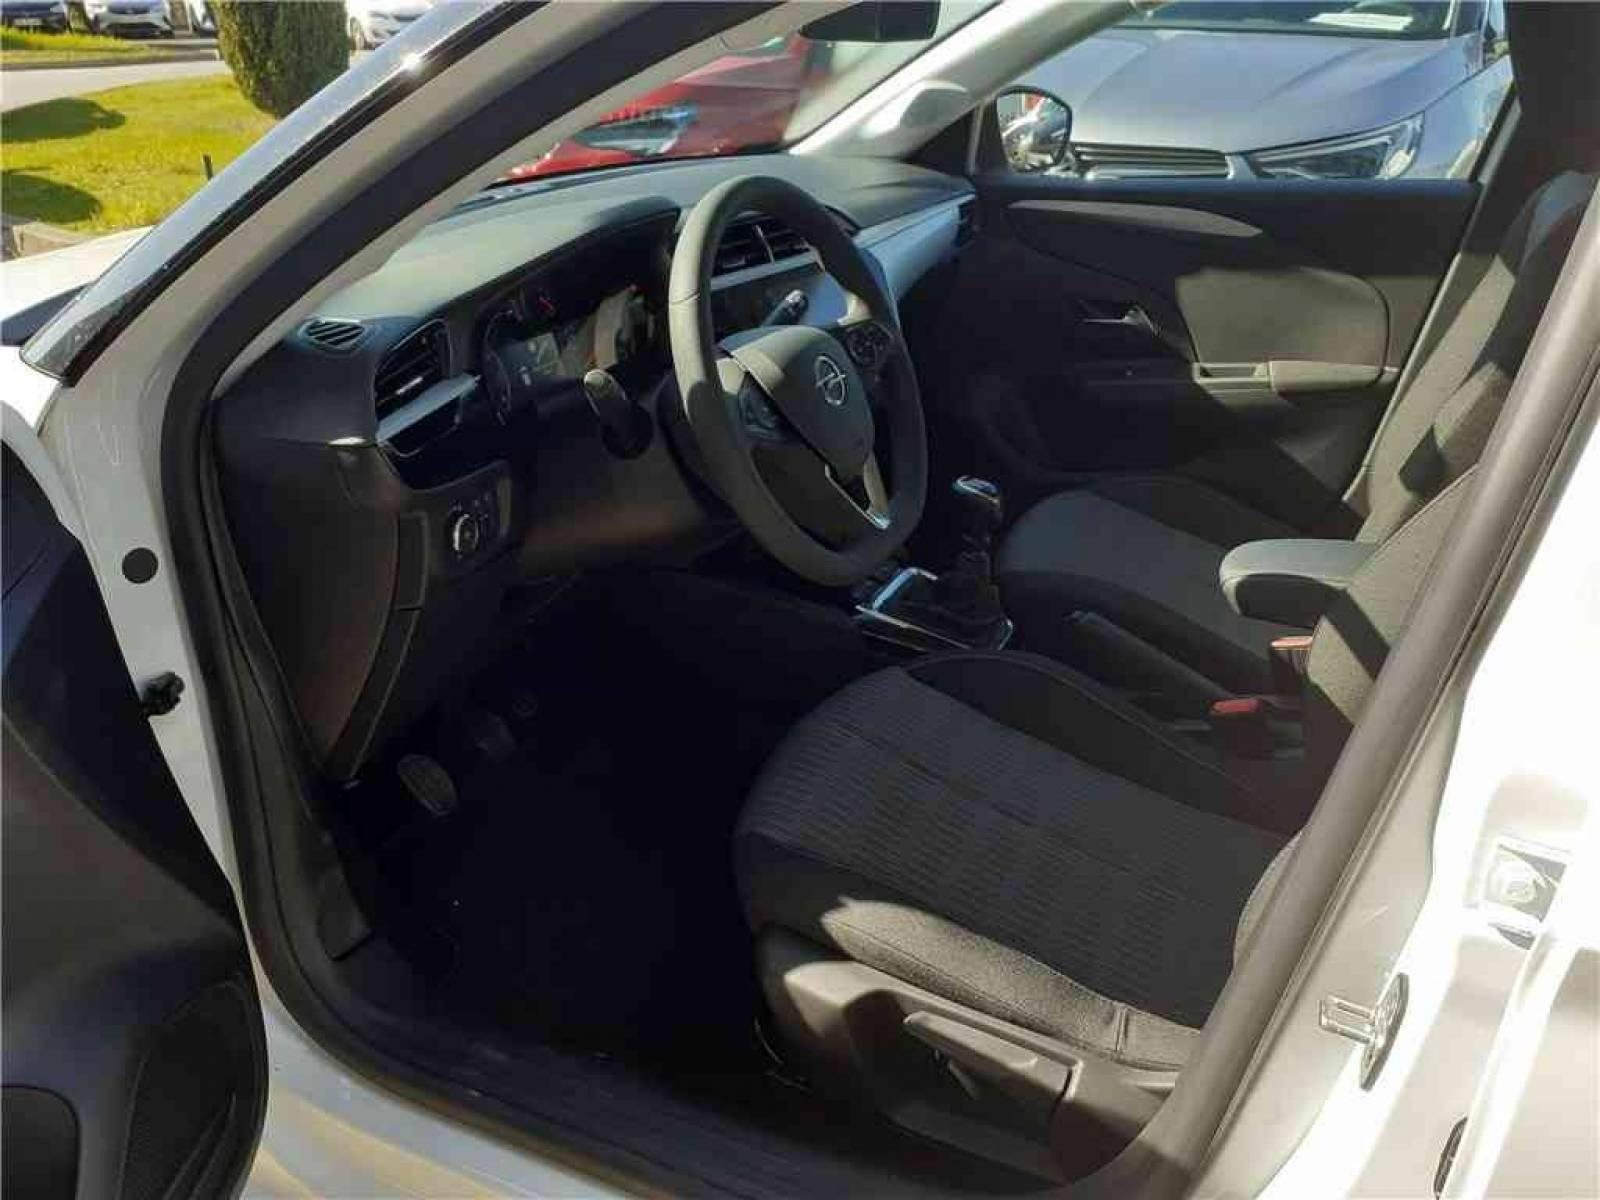 OPEL Corsa 1.2 Turbo 100 ch BVM6 - véhicule d'occasion - Groupe Guillet - Opel Magicauto - Chalon-sur-Saône - 71380 - Saint-Marcel - 36